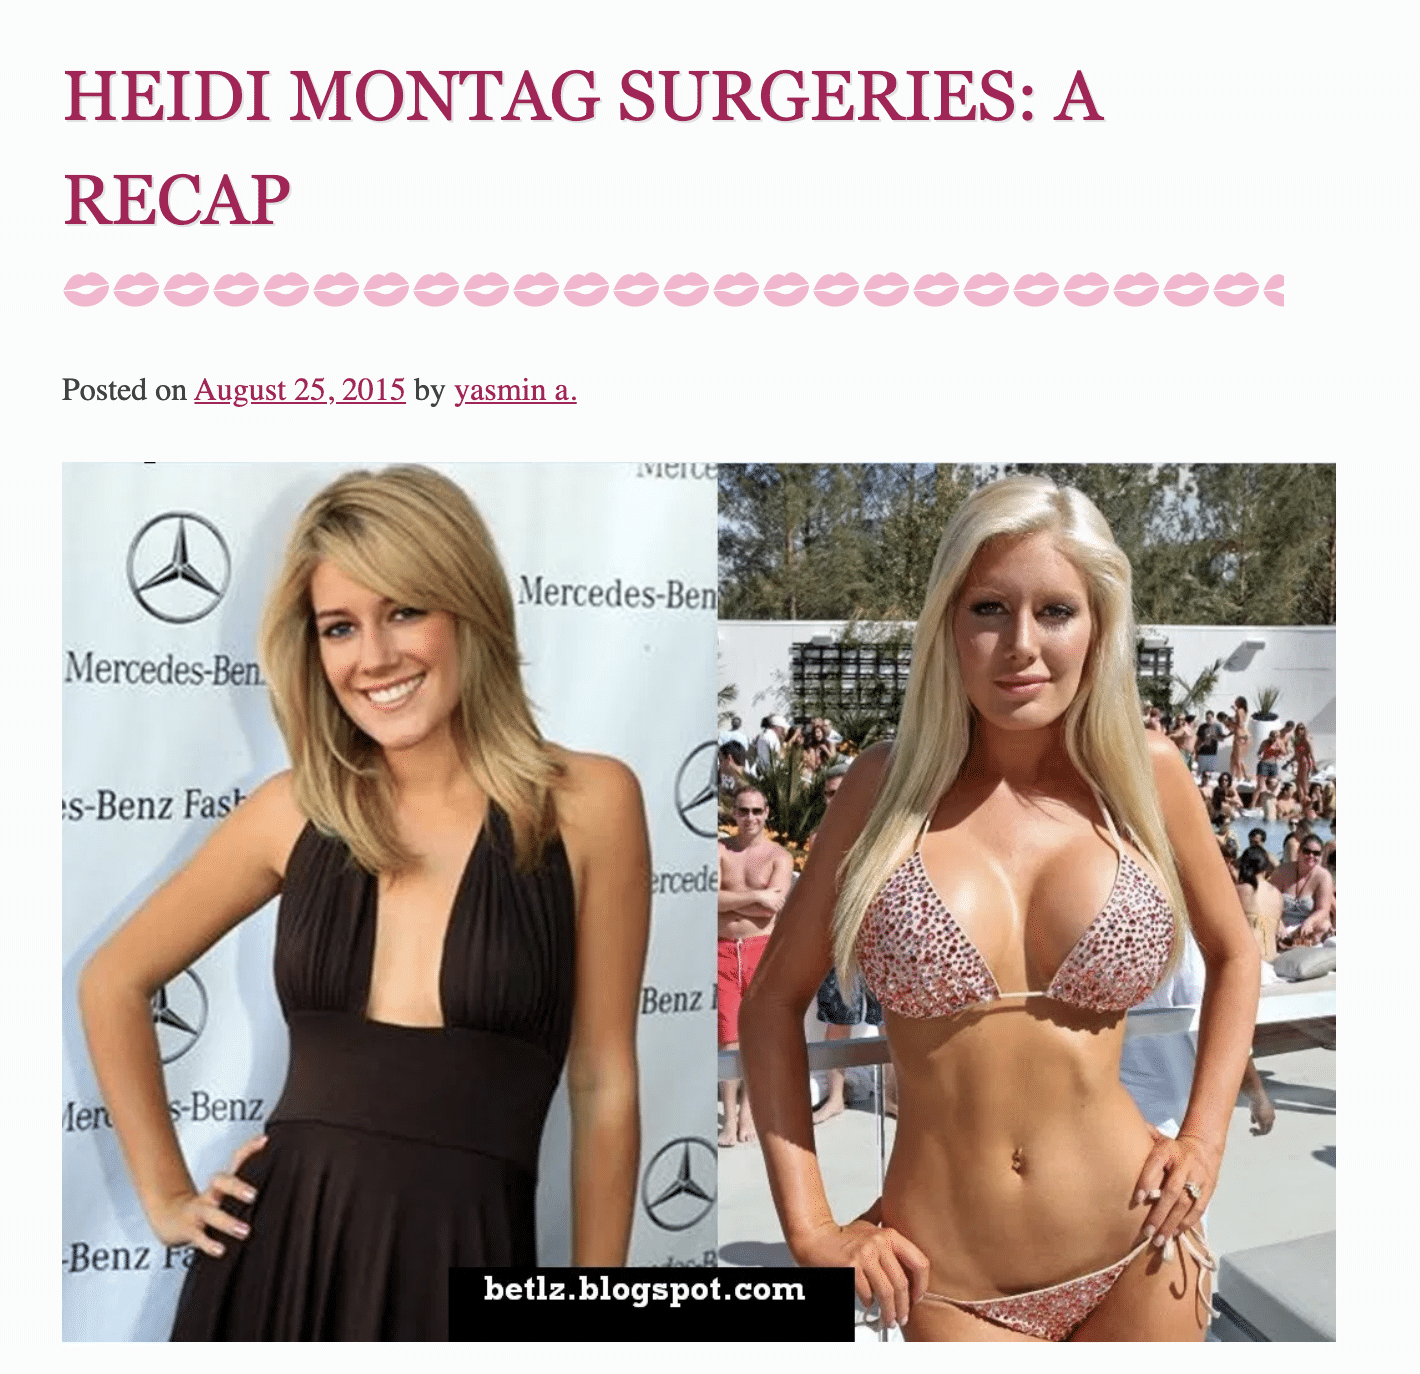 Heidi Montag Surgeries: A Recap